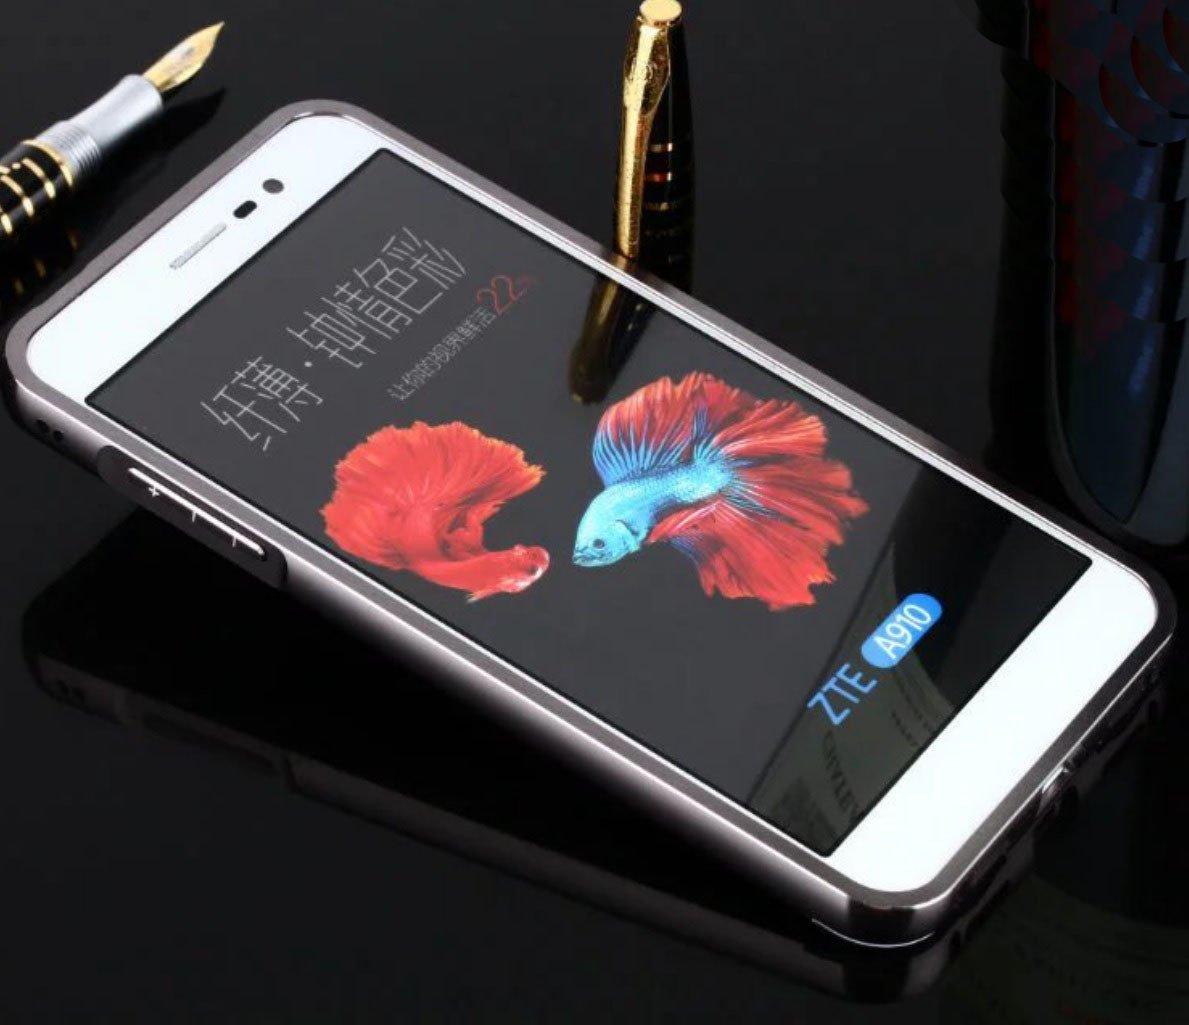 Amazon.com: ZTE AXON7 A2017 Mirror Case, Shiny Awesome Make ...